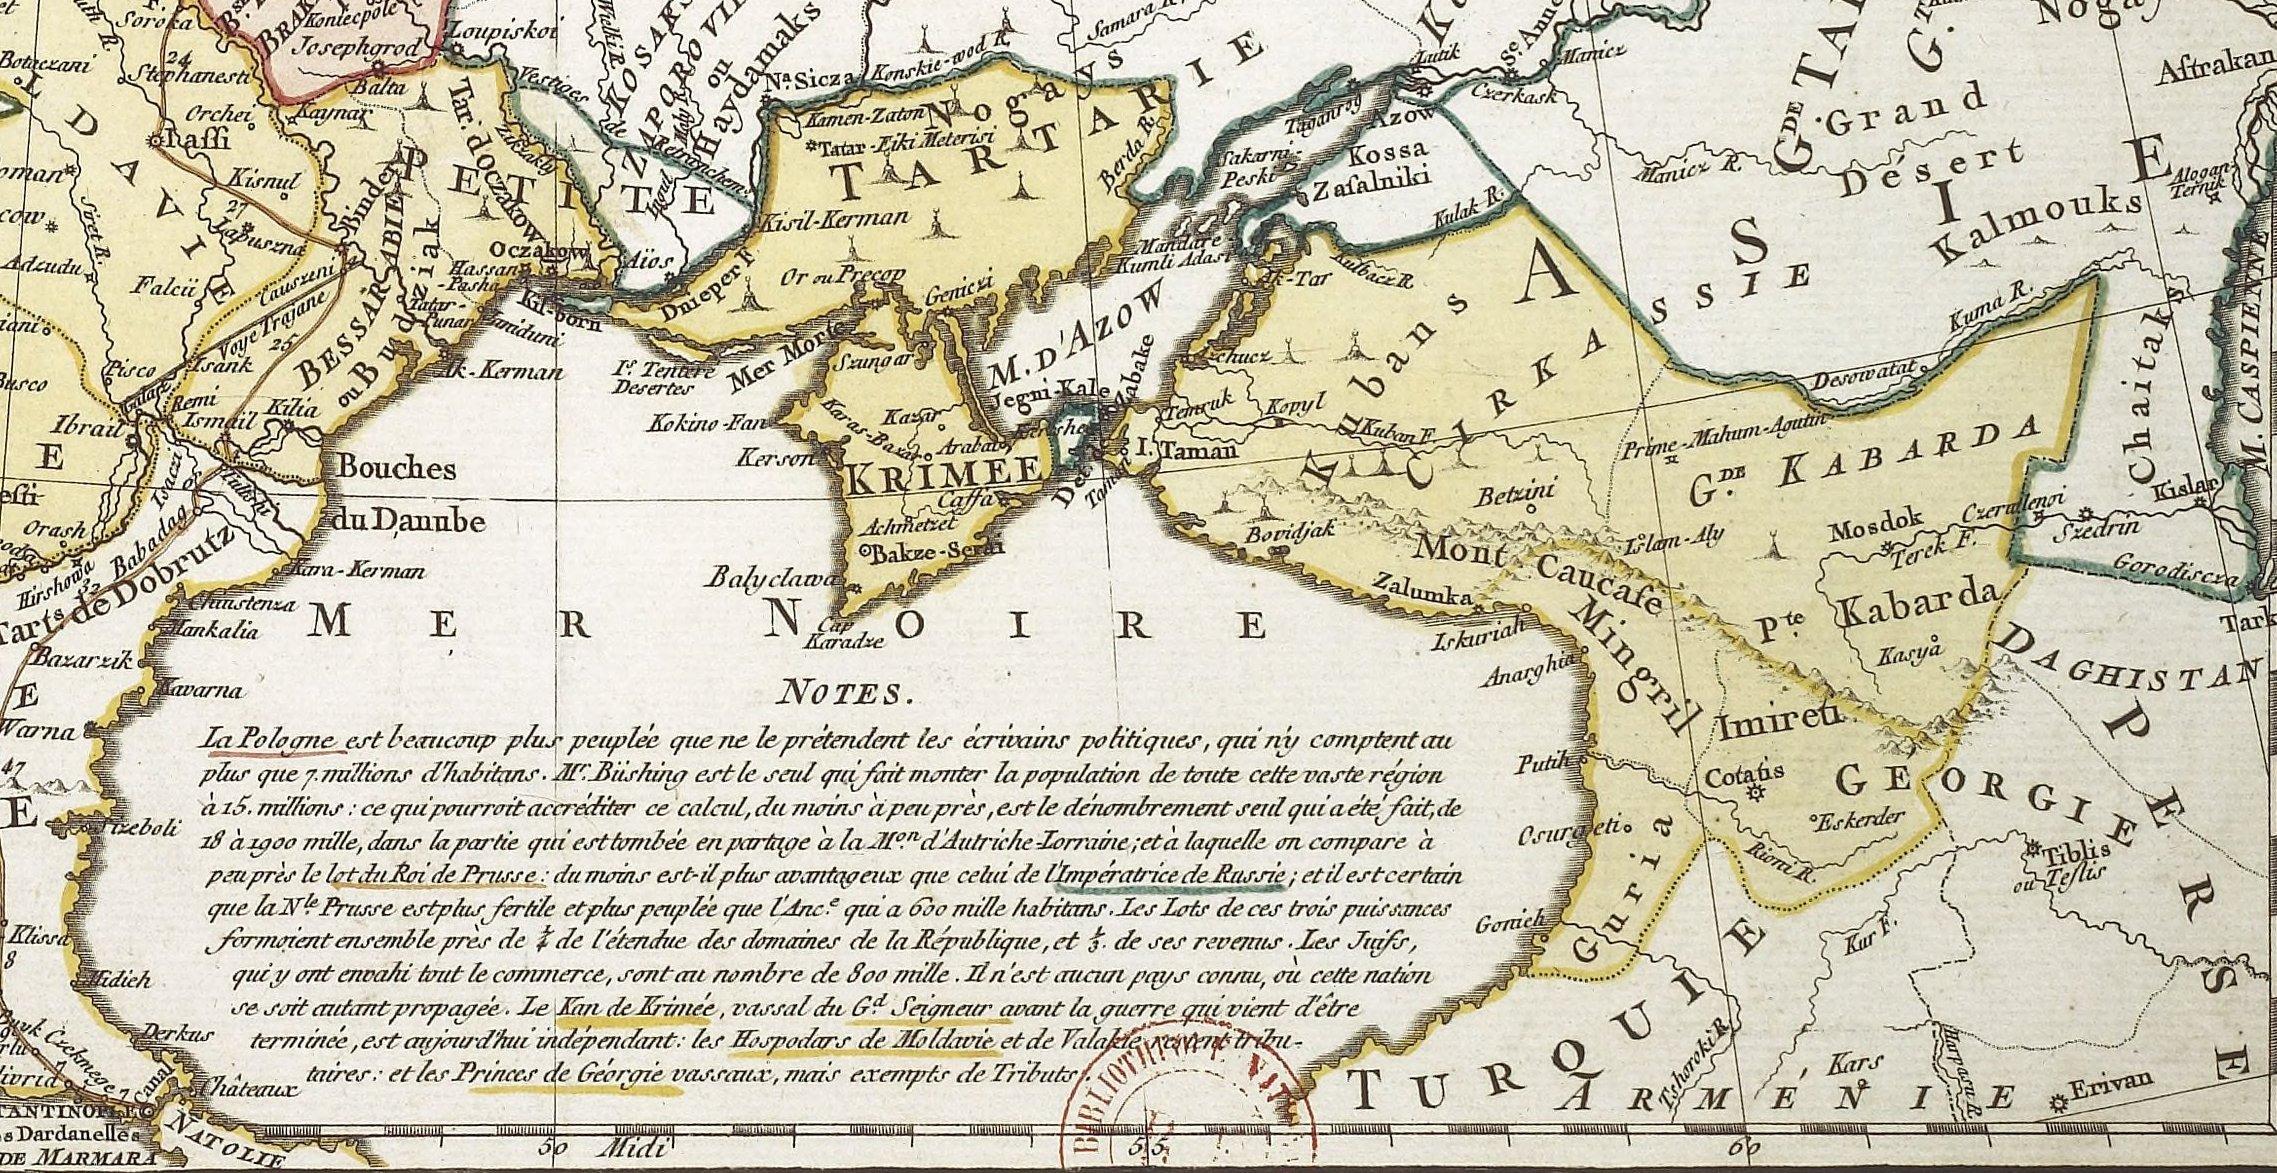 carte de l empire ottoman File:Brion de La Tour. Carte de l'empire Ottoman par la paix entre